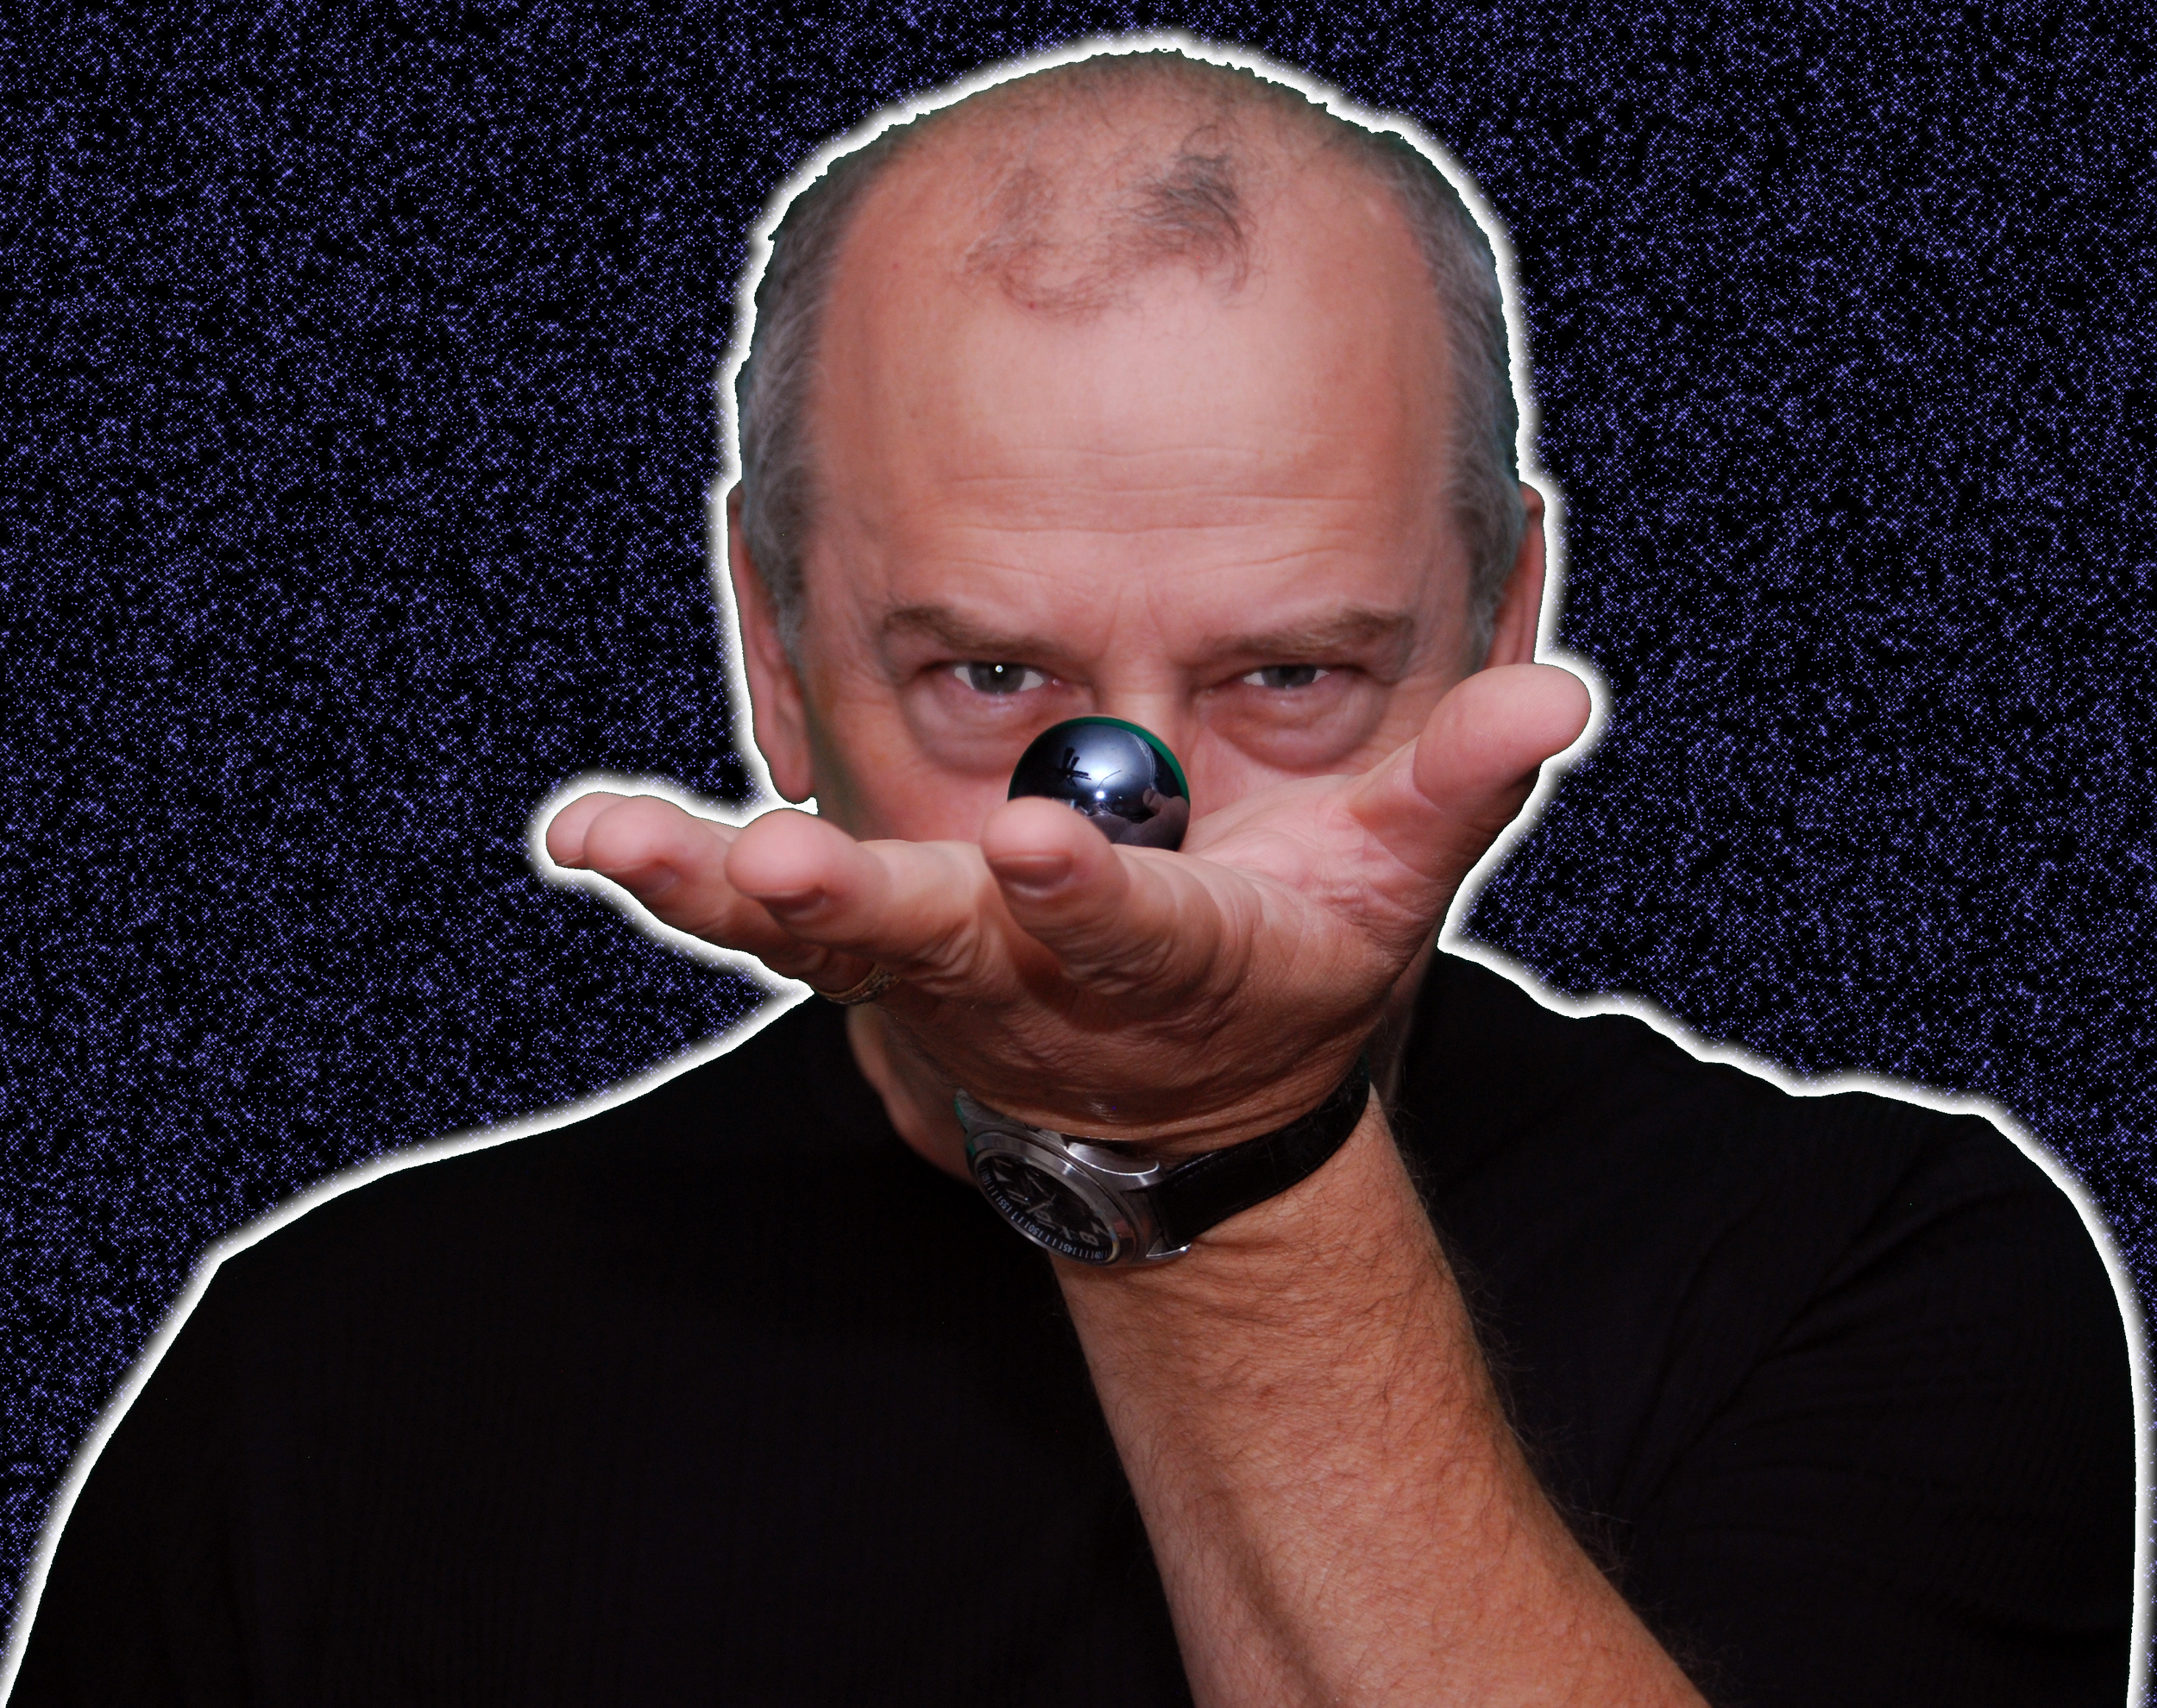 Master Magician/Mentalist Doug Anderson